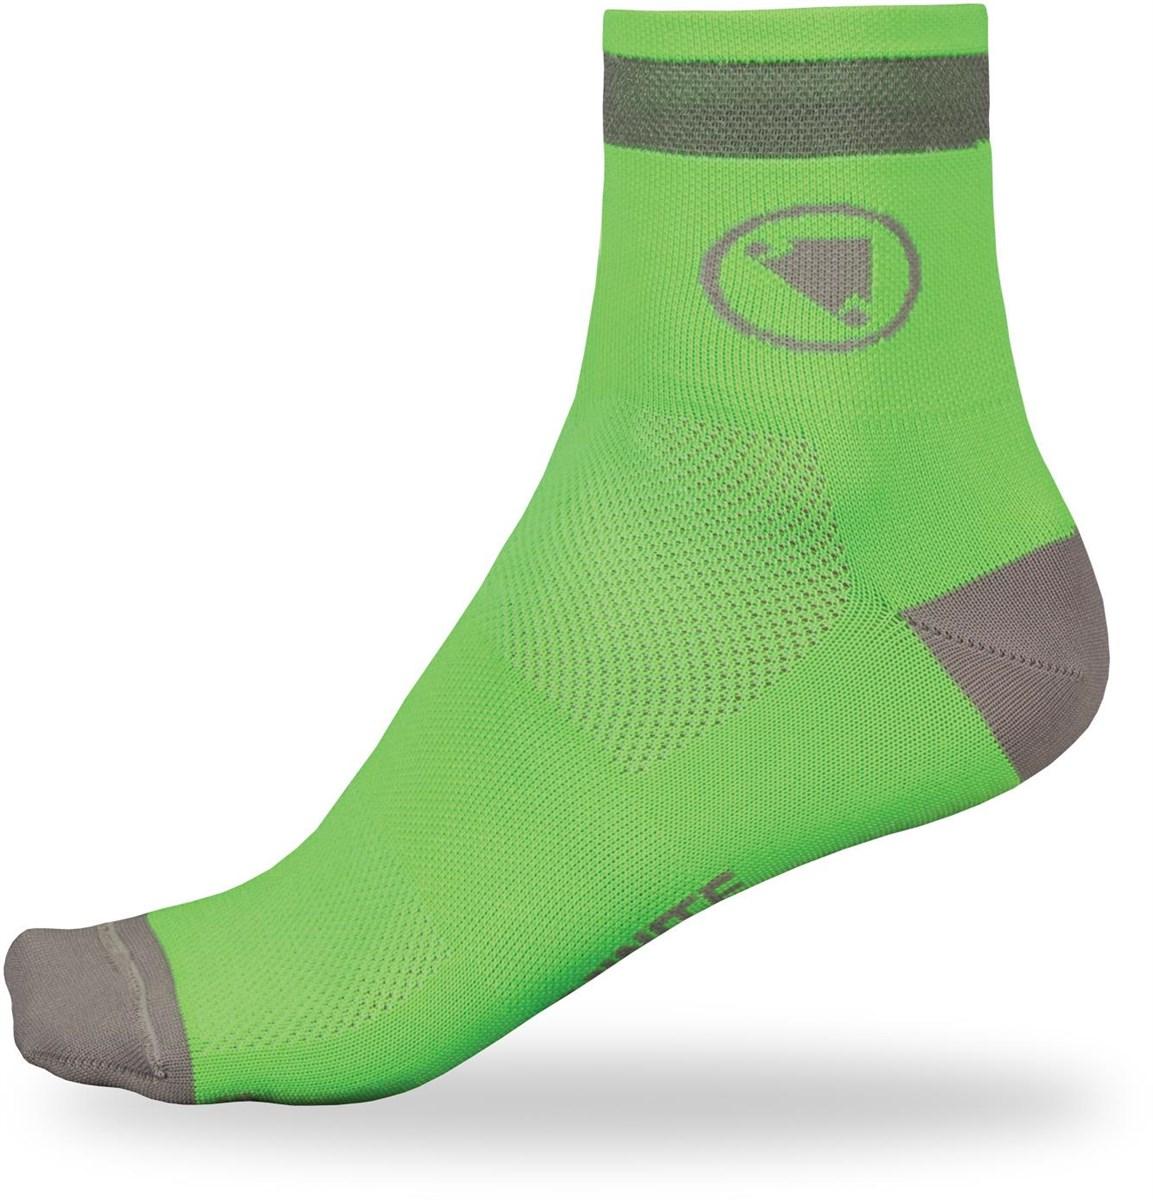 Endura Luminite Cycling Socks - Twin Pack | Socks